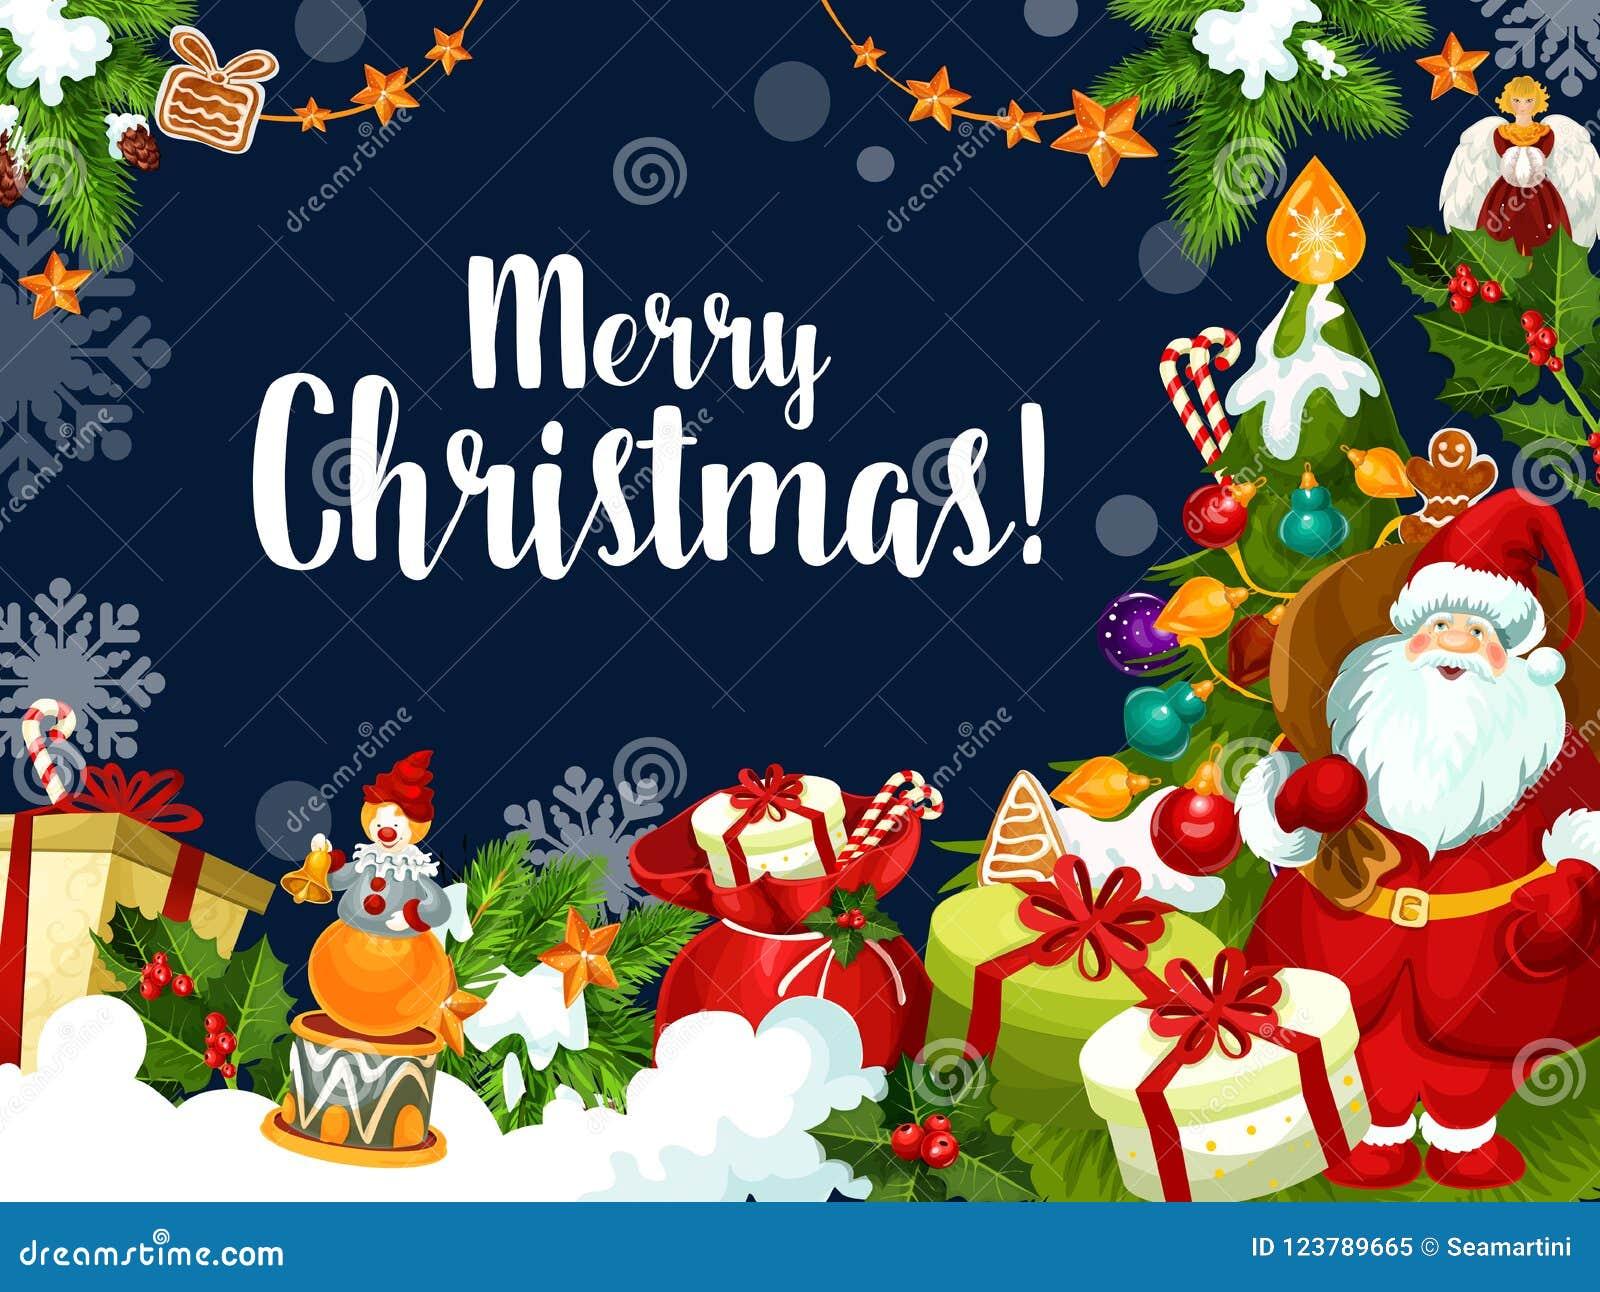 Christmas wish santa greetings vector card stock vector merry christmas greeting card and best wishes for xmas winter holiday season vector santa with gifts and decorations under christmas tree snowflakes and m4hsunfo